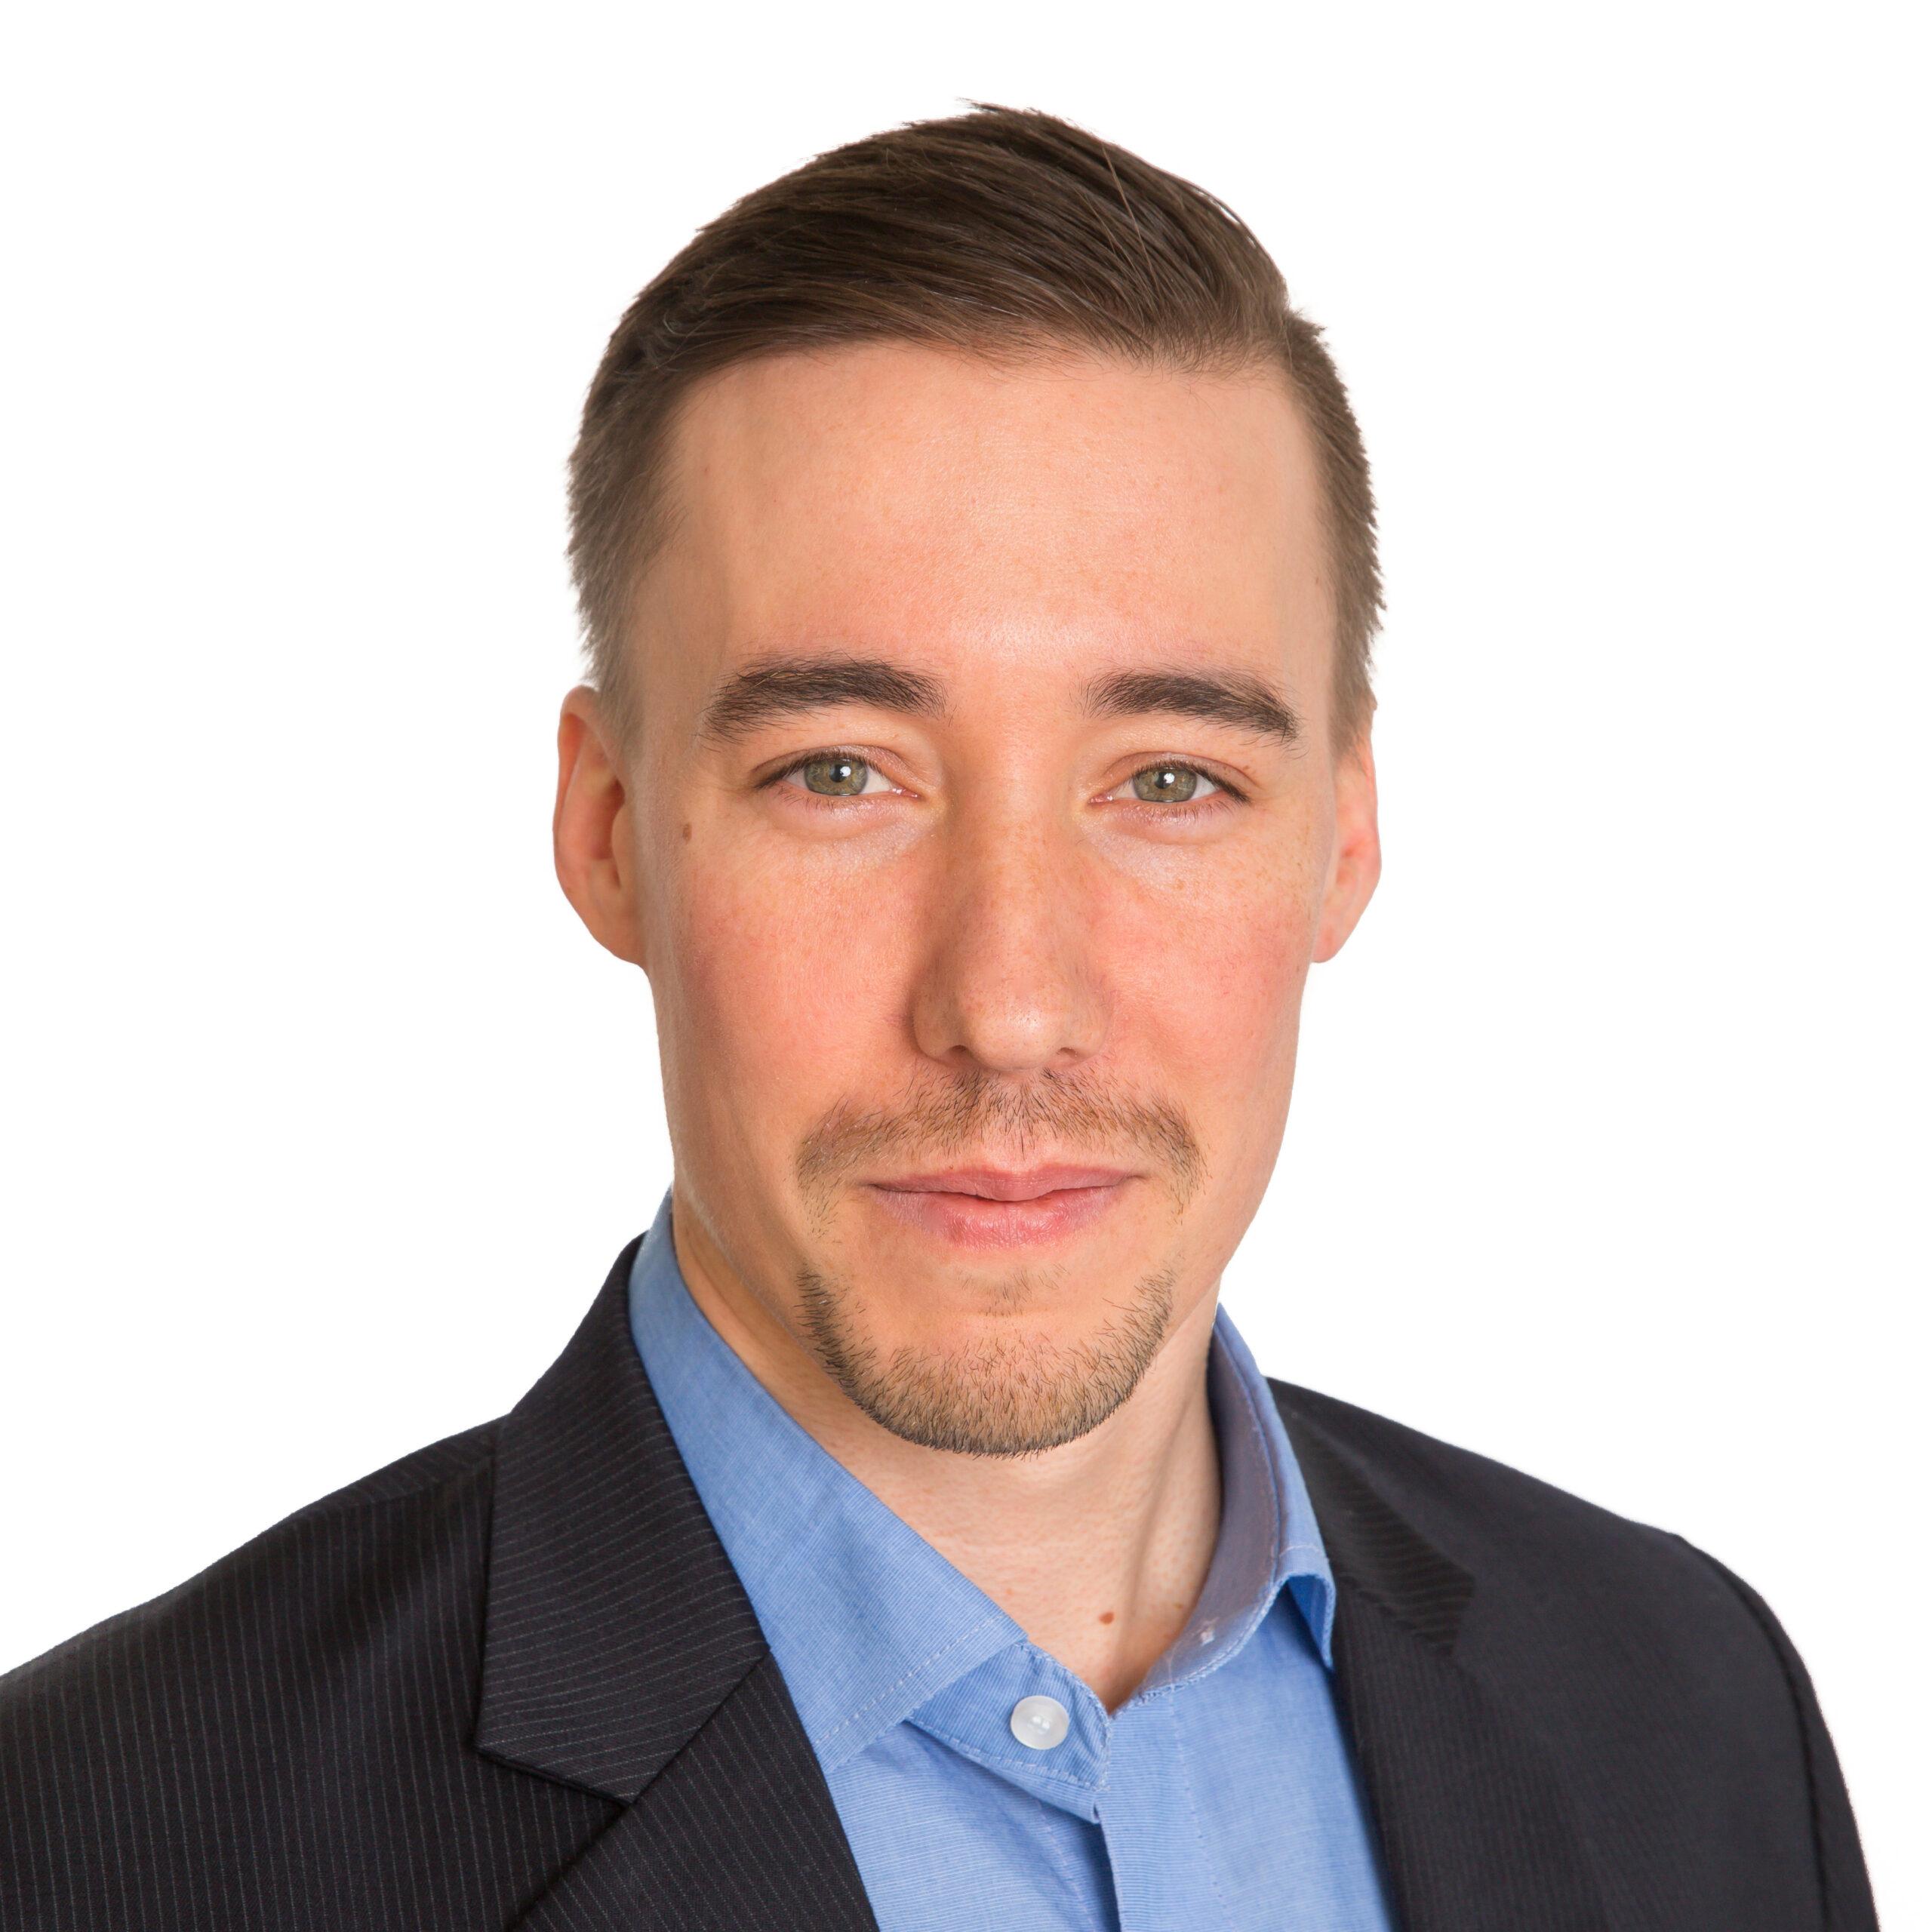 Christian Ahlholm